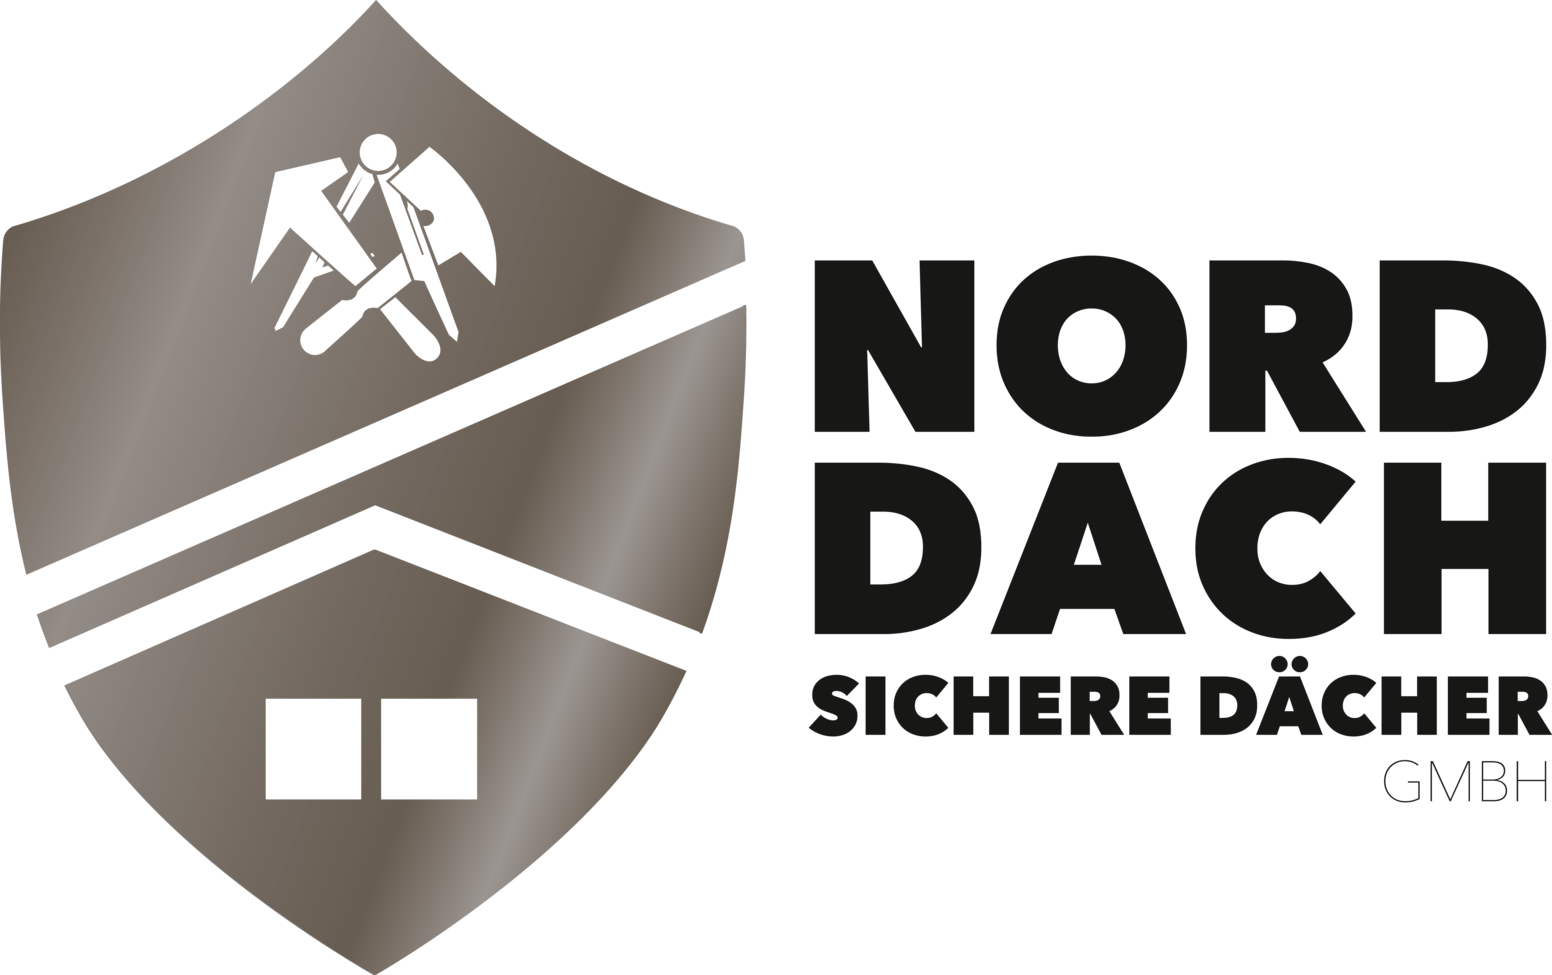 Norddach - Dachdeckerei & Facility Management in Hamburg